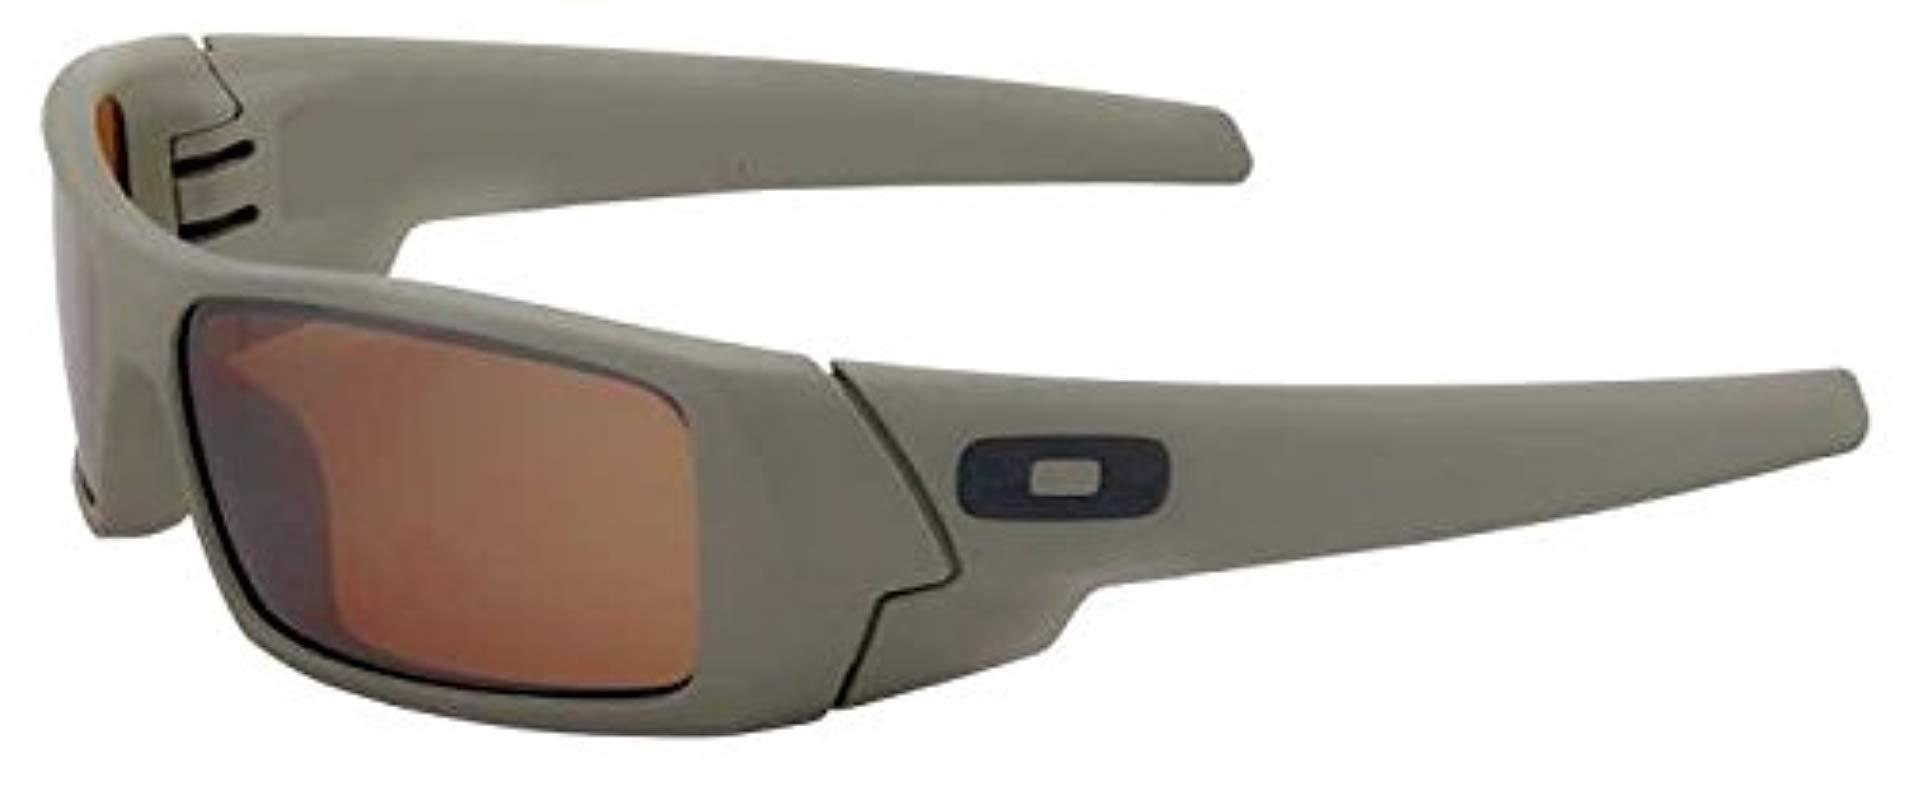 47ae93cdc0f3f ... sweden lyst oakley gascan non polarized iridium rectangular sunglasses  e8cfa c45fd